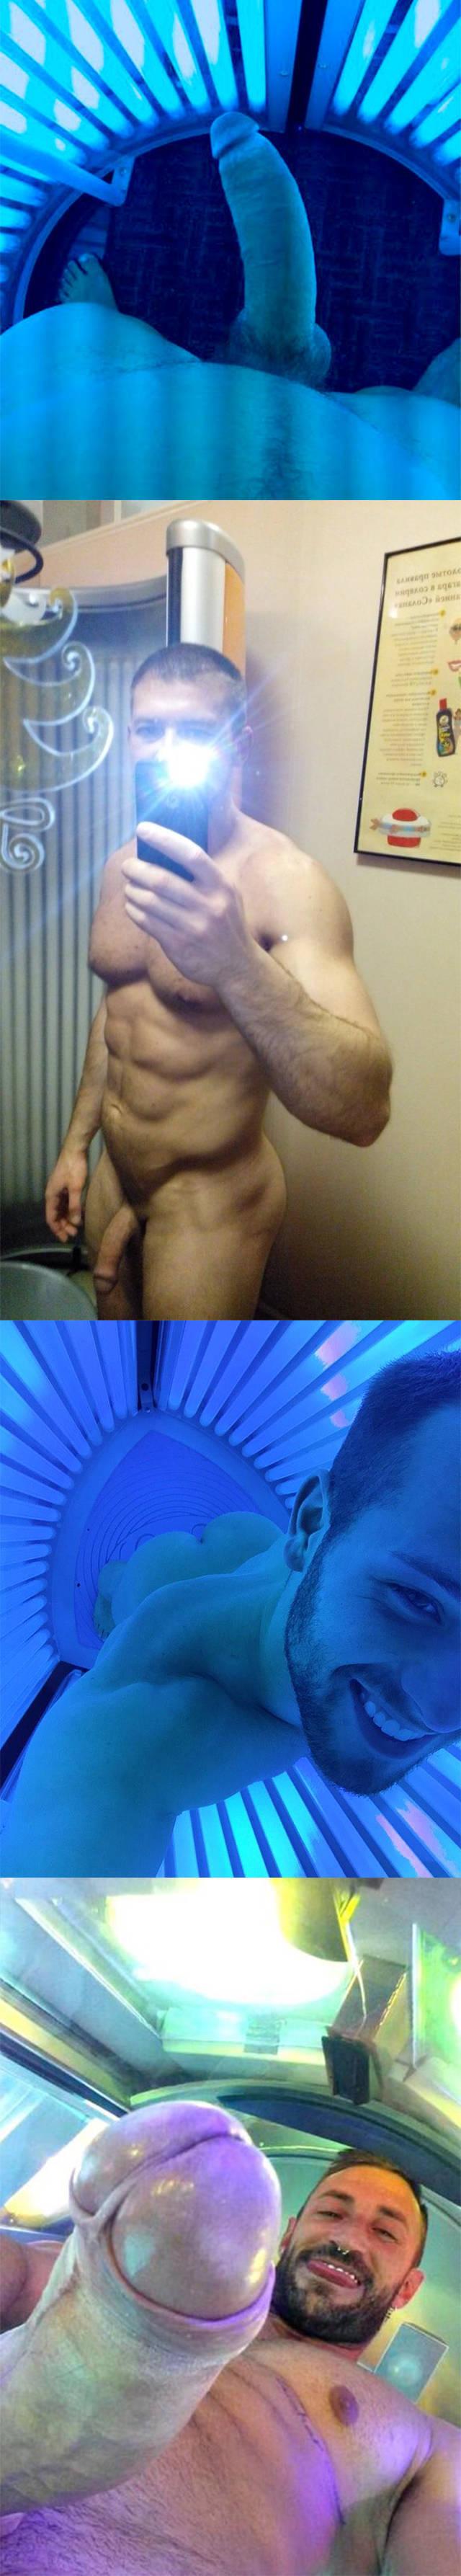 voyeur hardon studs naked solarium